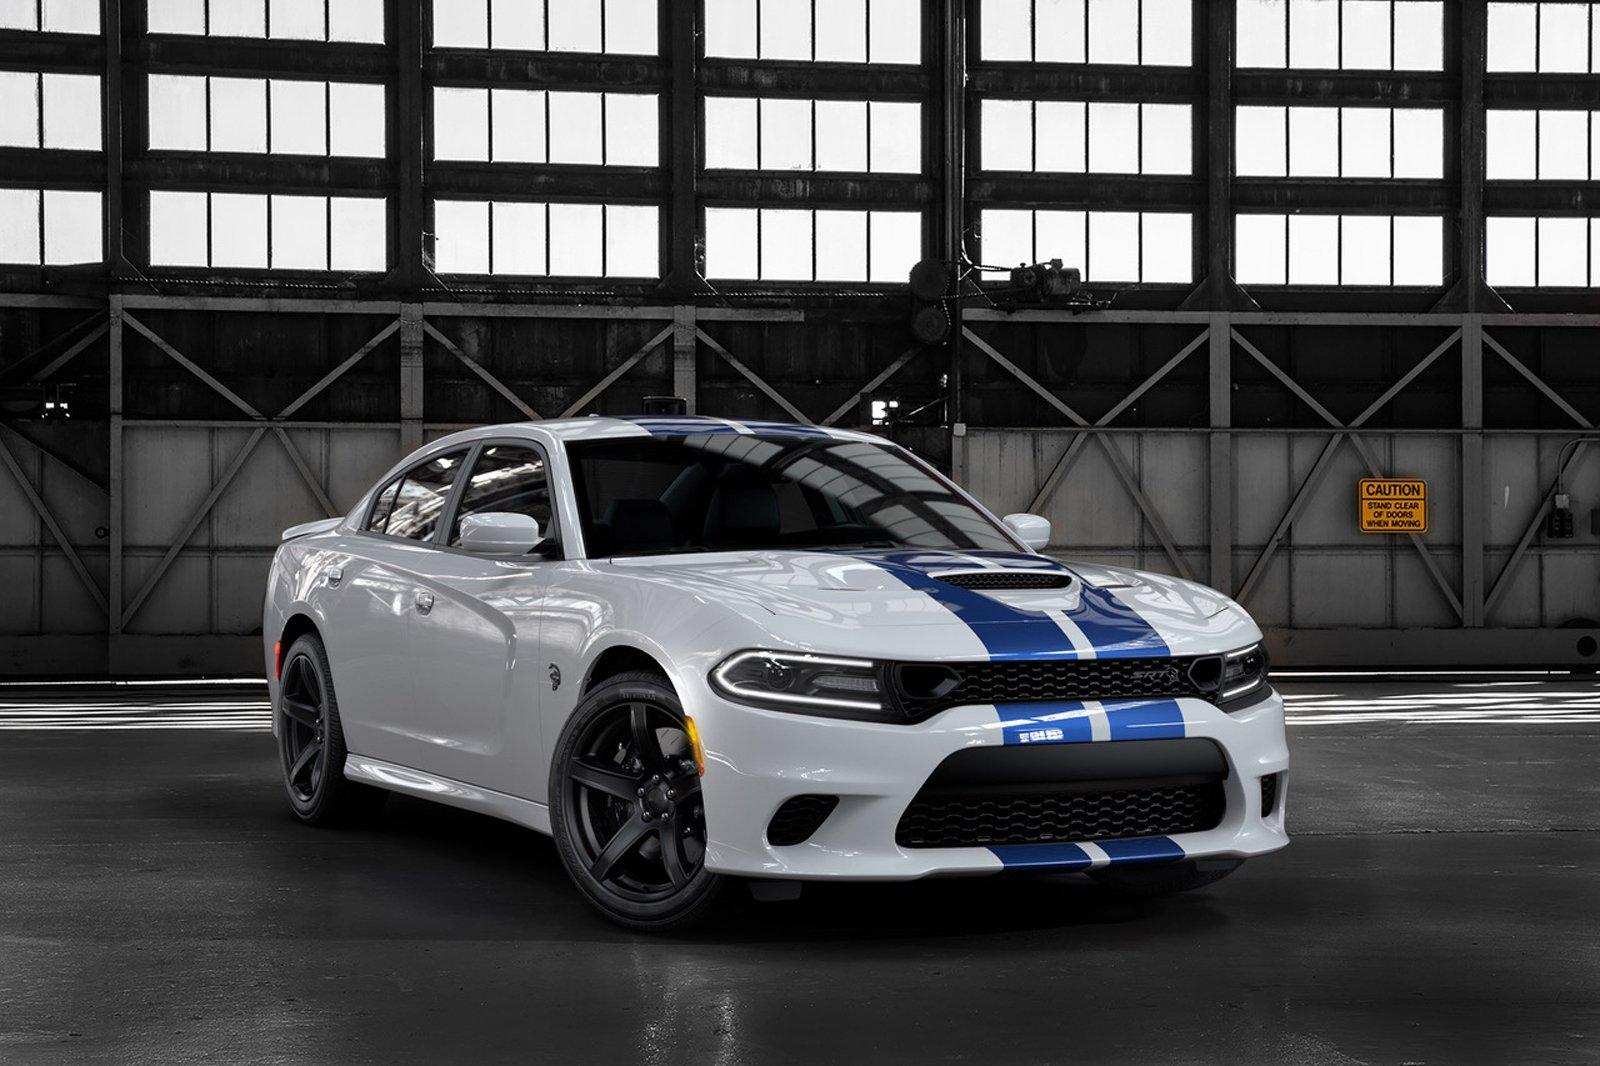 Dodge Charger SRT Hellcat MY 2019